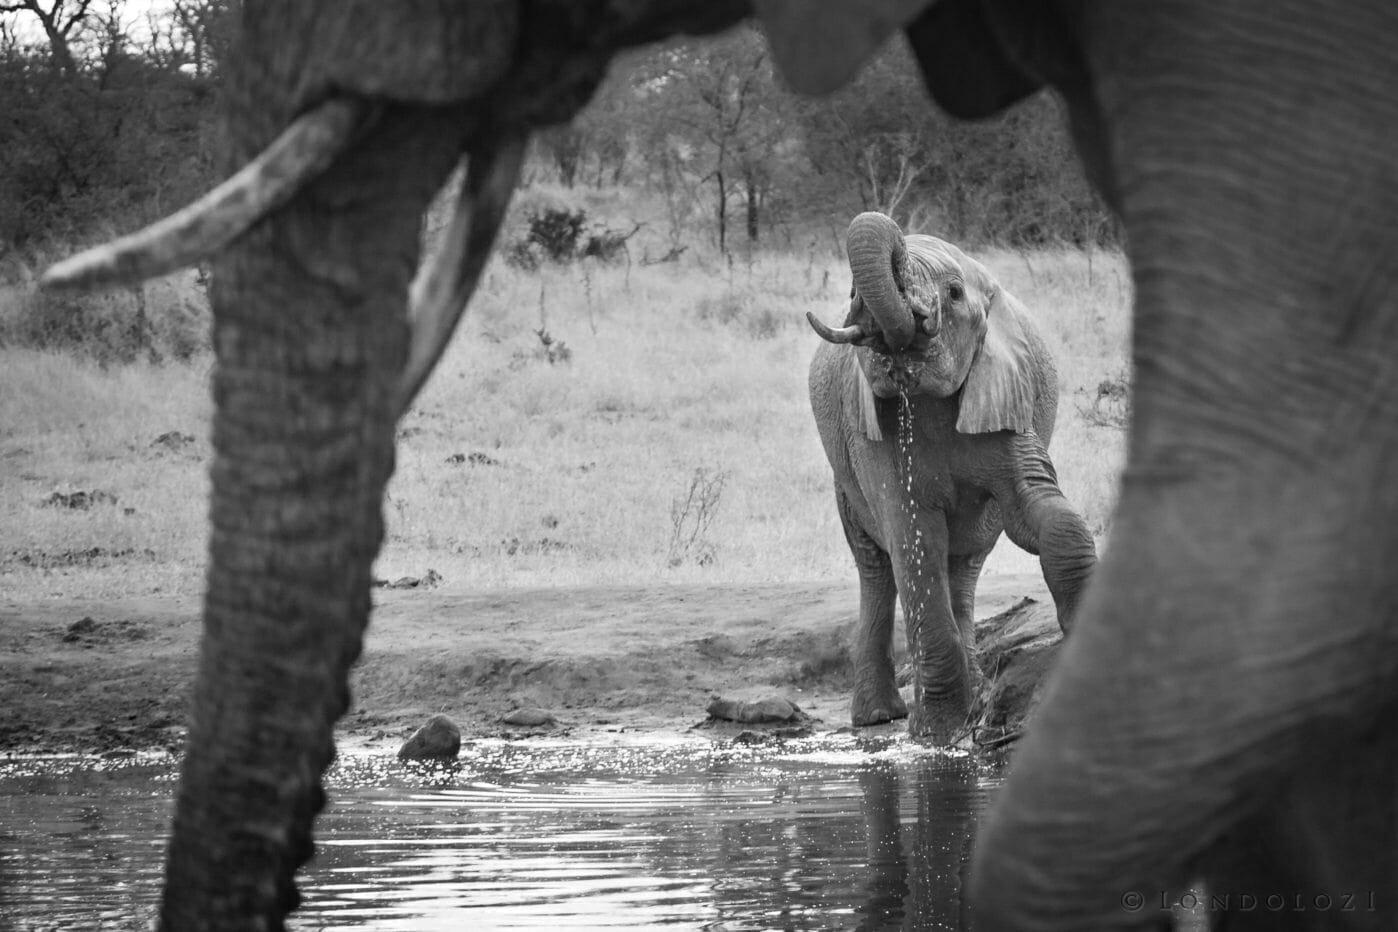 Elephant, drinking, trunk, frame, waterhole, black and white